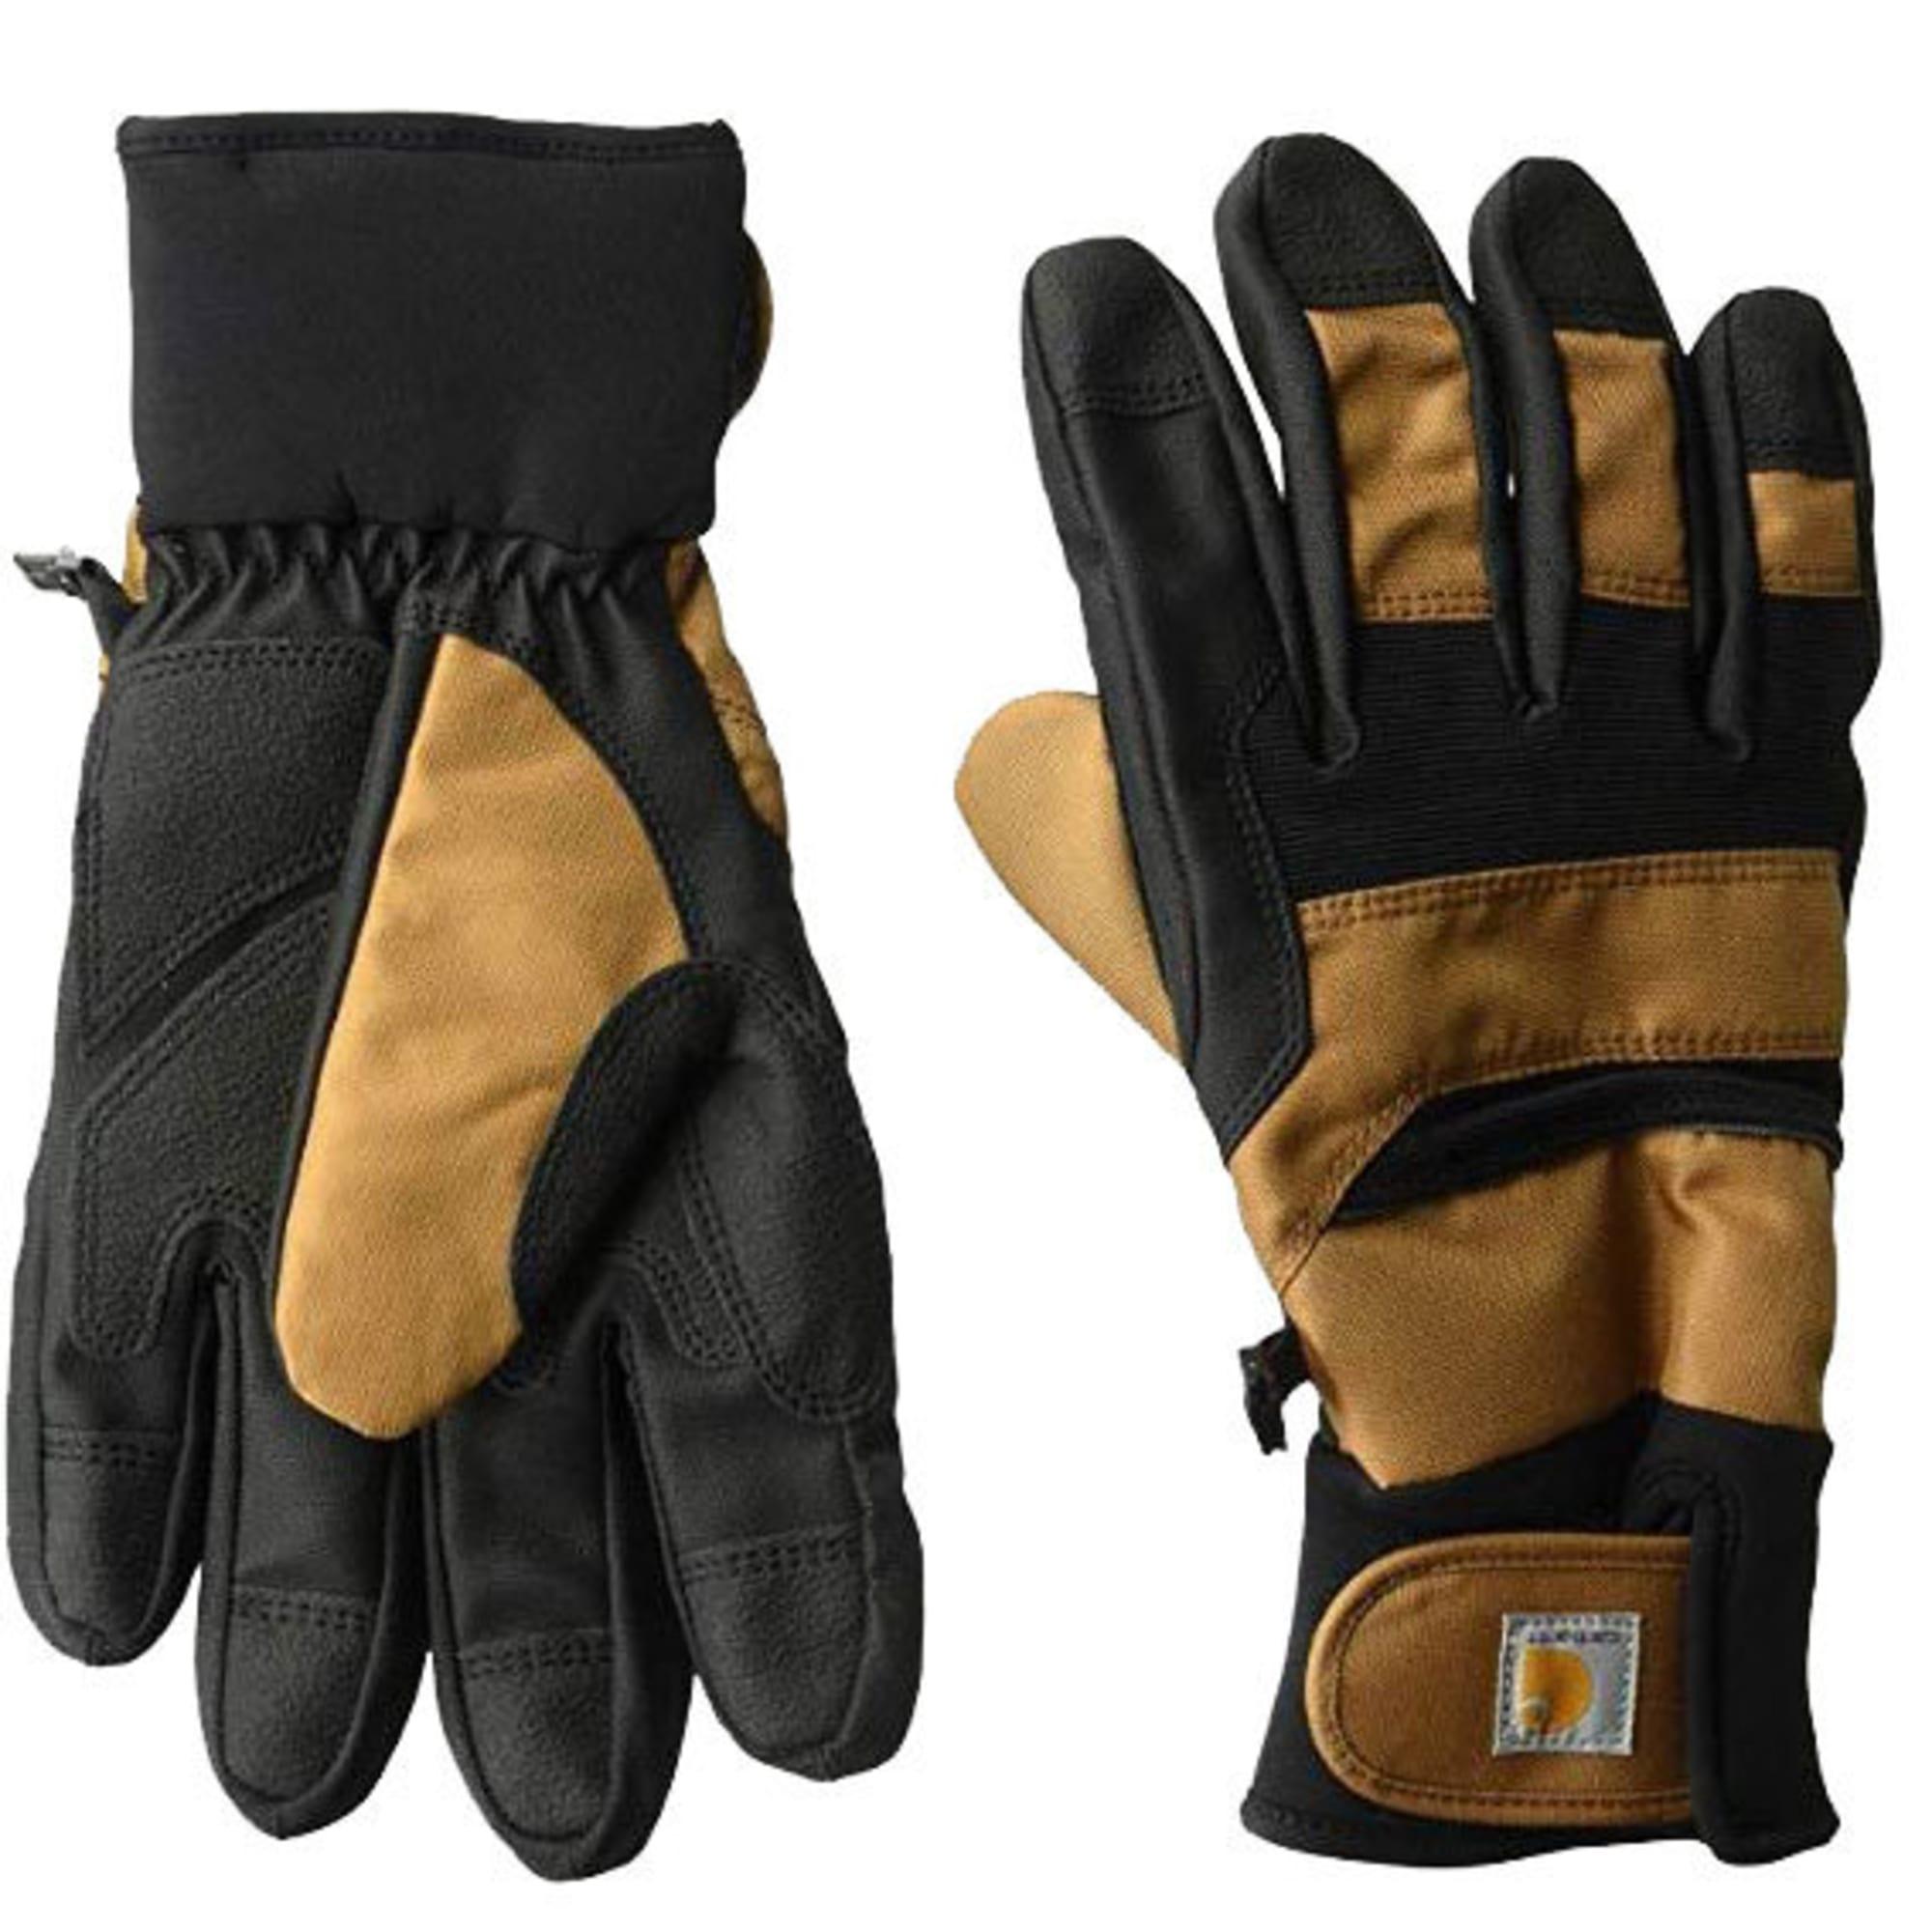 Carhartt Men/'s Insulated Flexer Gloves Waterproof Black Small NEW!